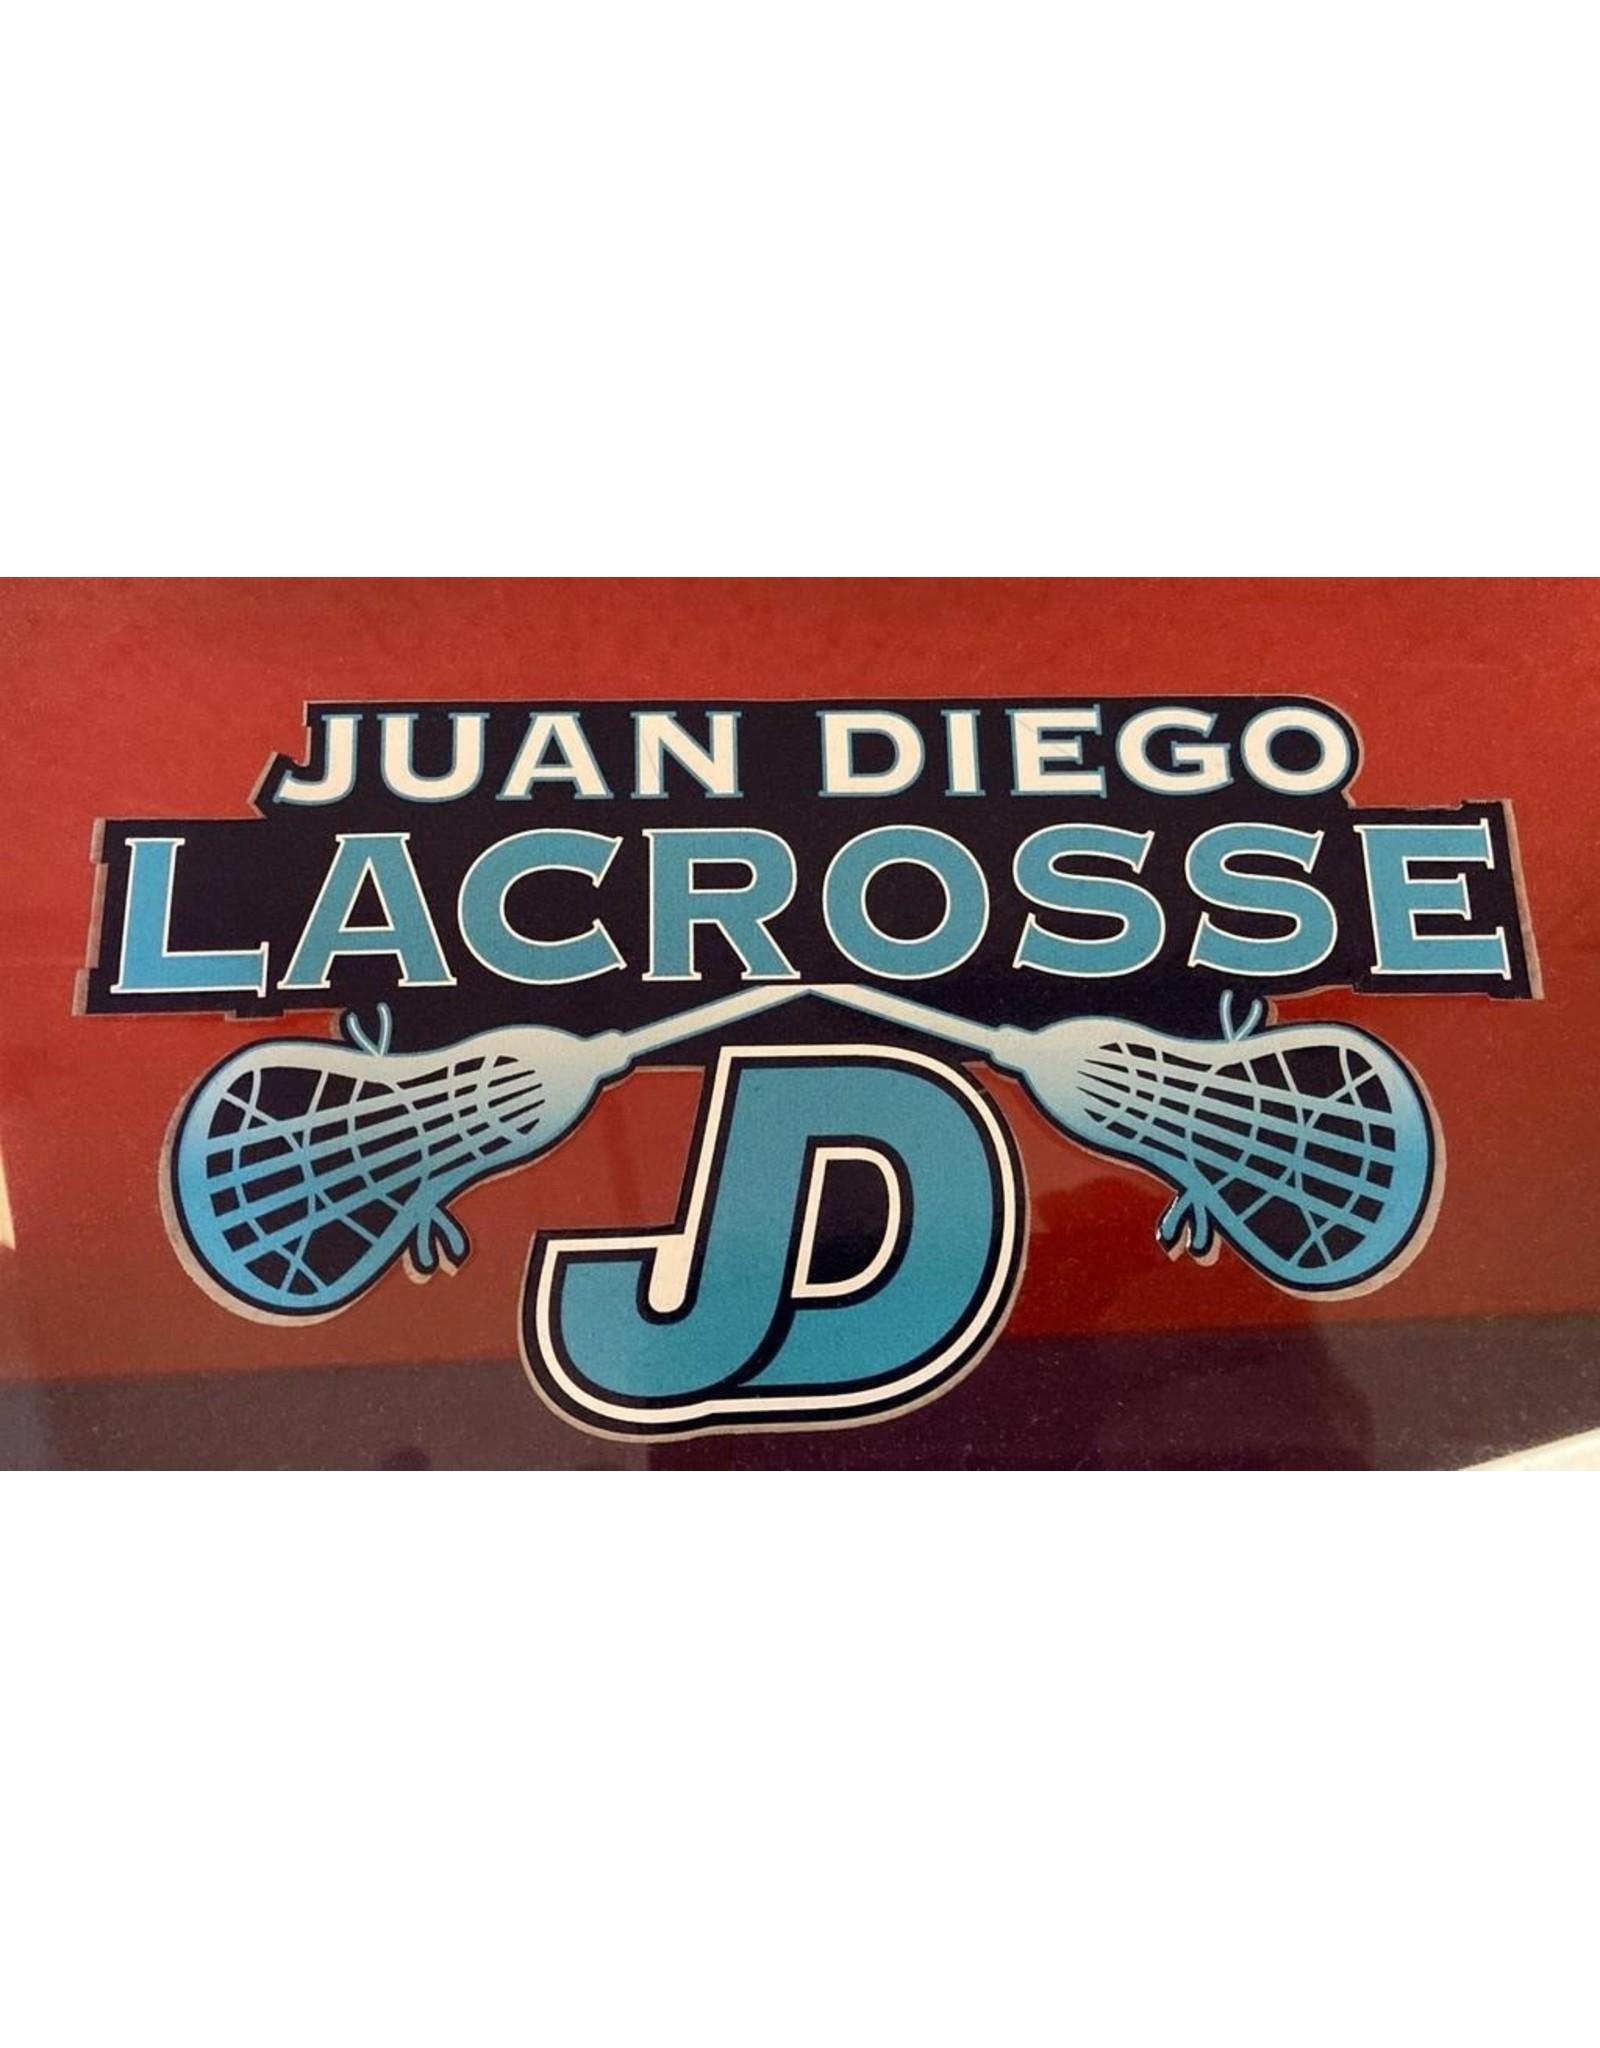 NON-UNIFORM Lacrosse - JD Lacrosse Decal, navy/white/turquoise